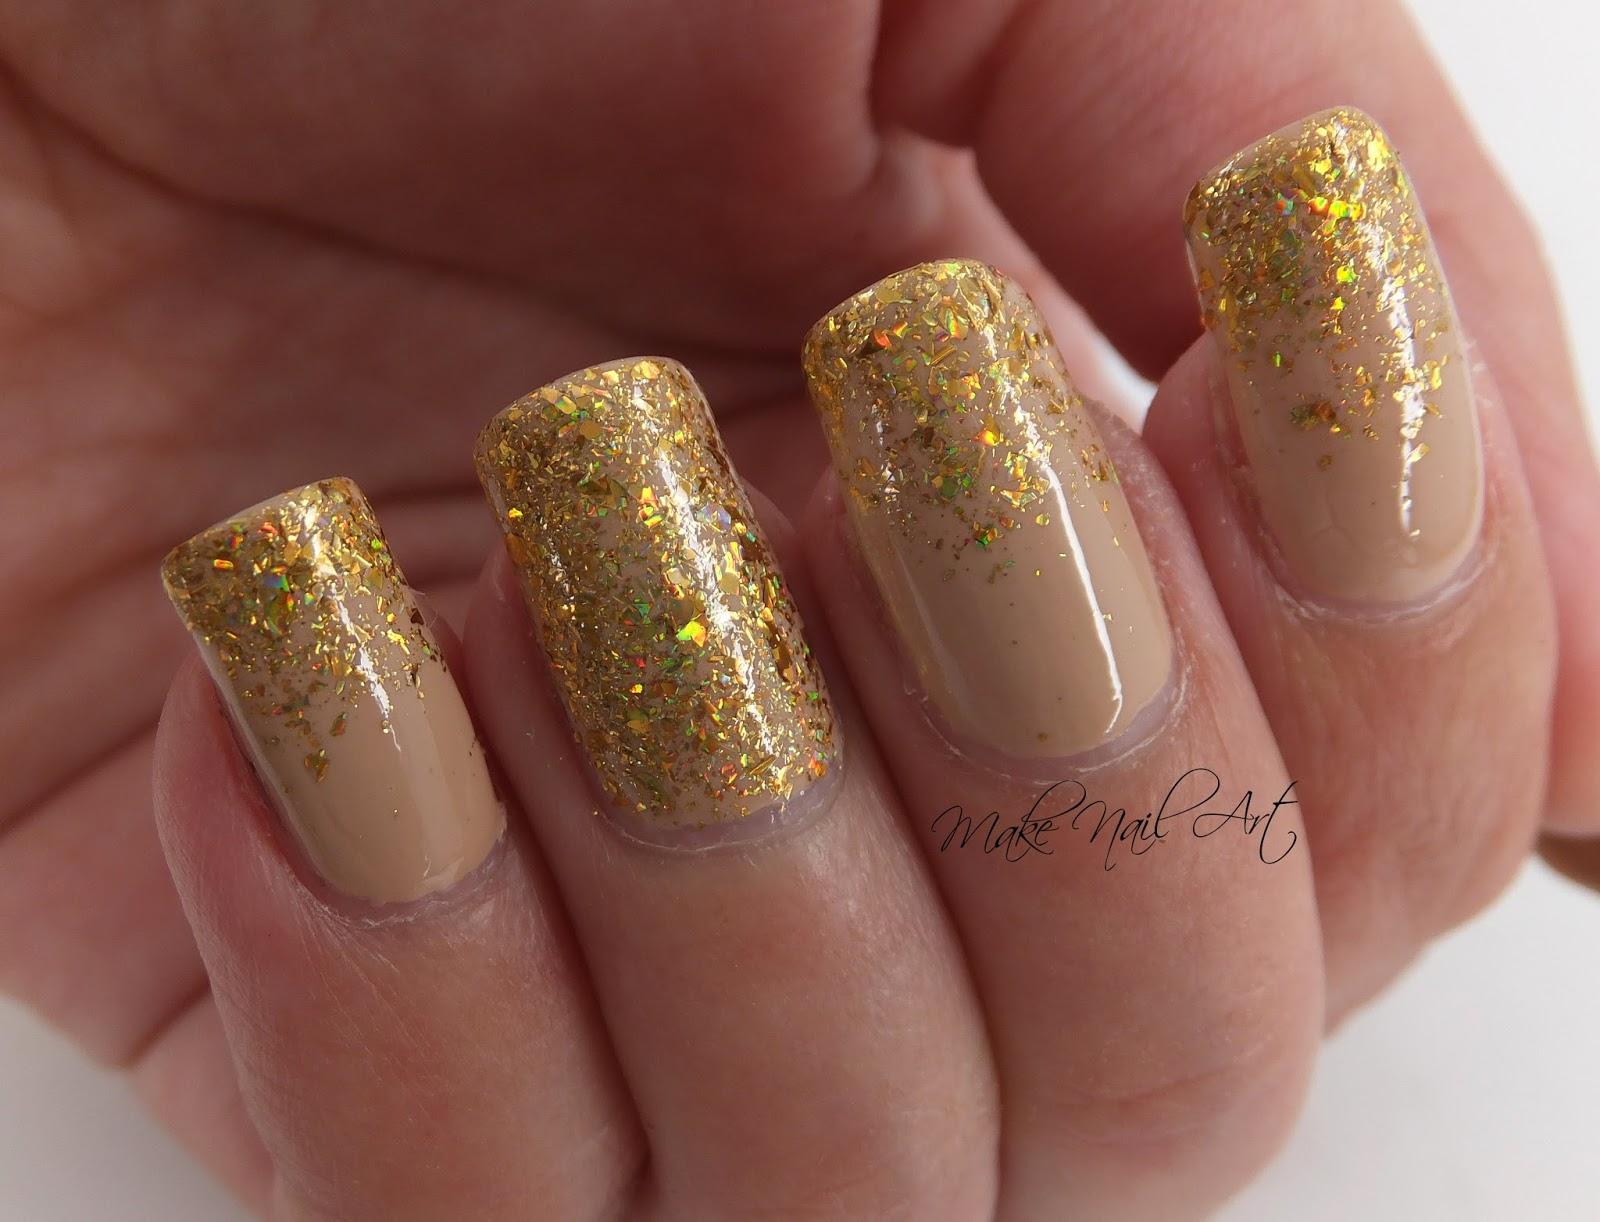 Make Nail Art Nude And Gold Glitter Elegant Nails Nail Art Design